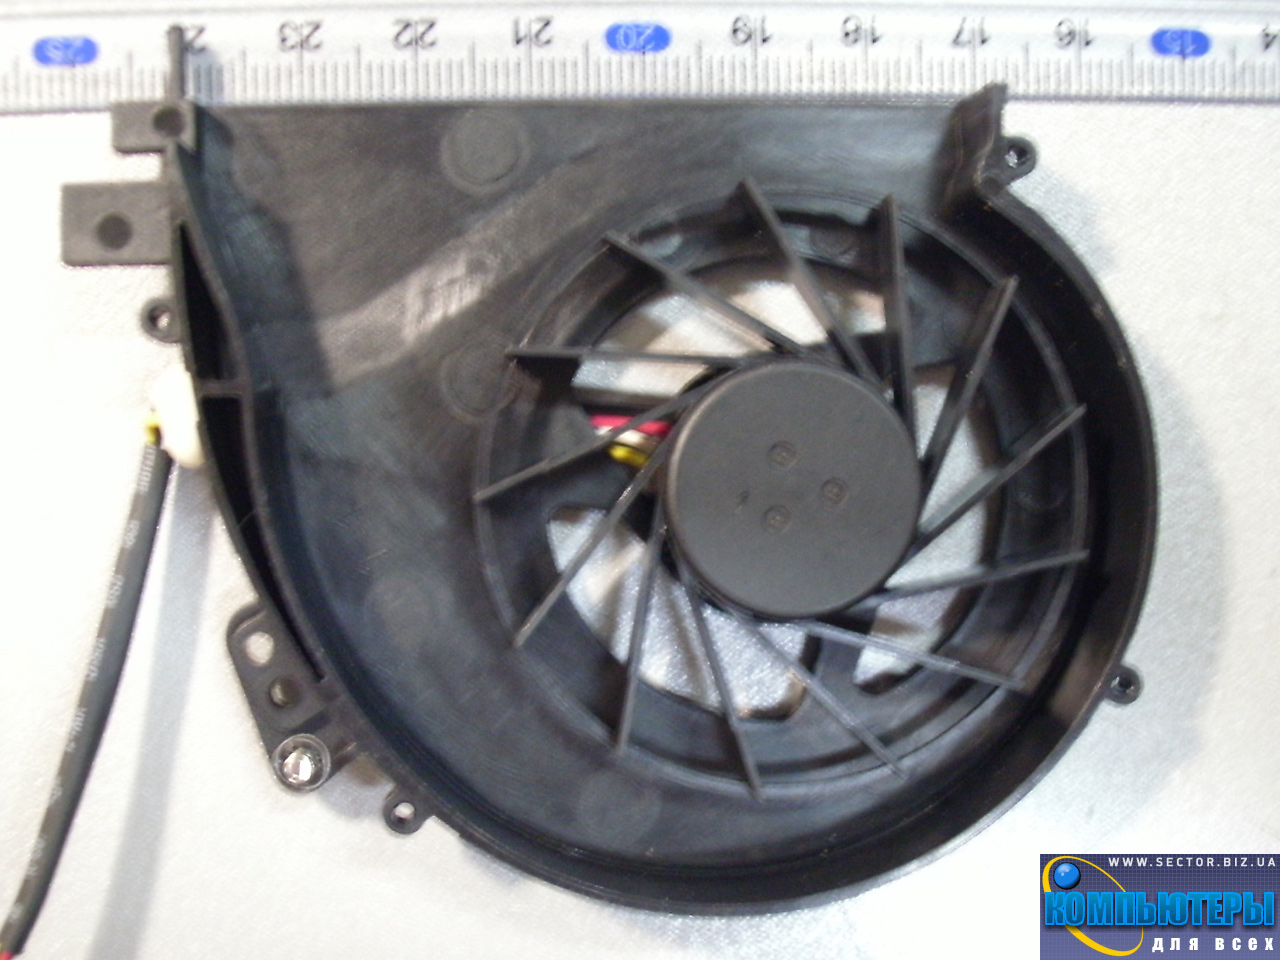 Кулер к ноутбуку Acer Extensa 5235 5635 5635G 5635Z 5635ZG ZR6 p/n: MF60090V1-C120-S99. Фото № 2.